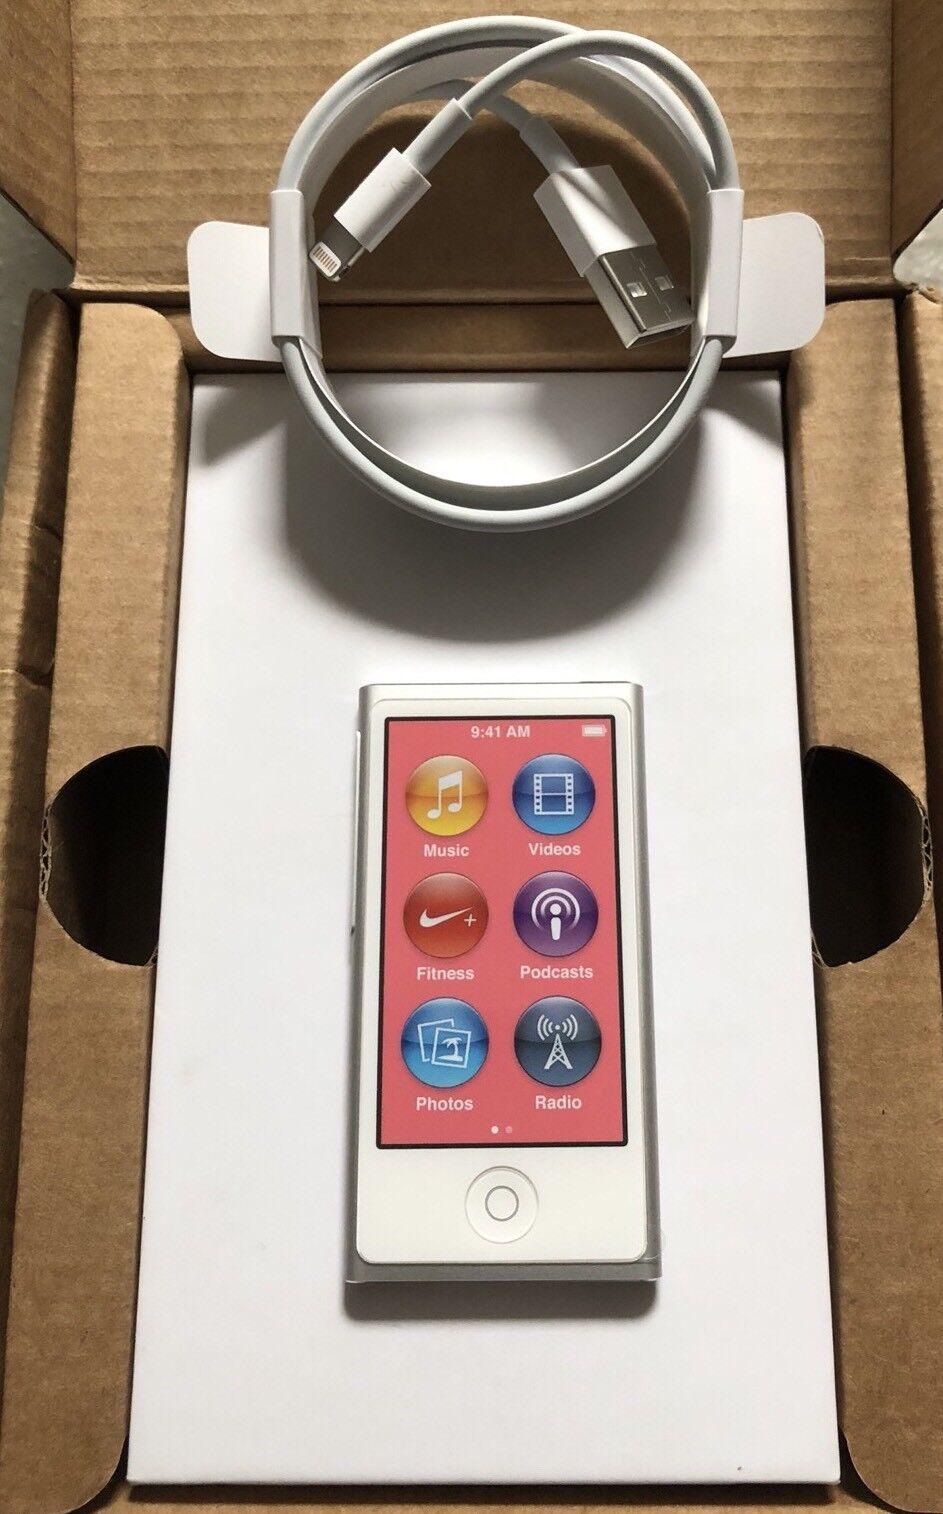 Apple Ipod Nano 7. Generation 7G Weiss Silber White Silver 16GB NEU NEW